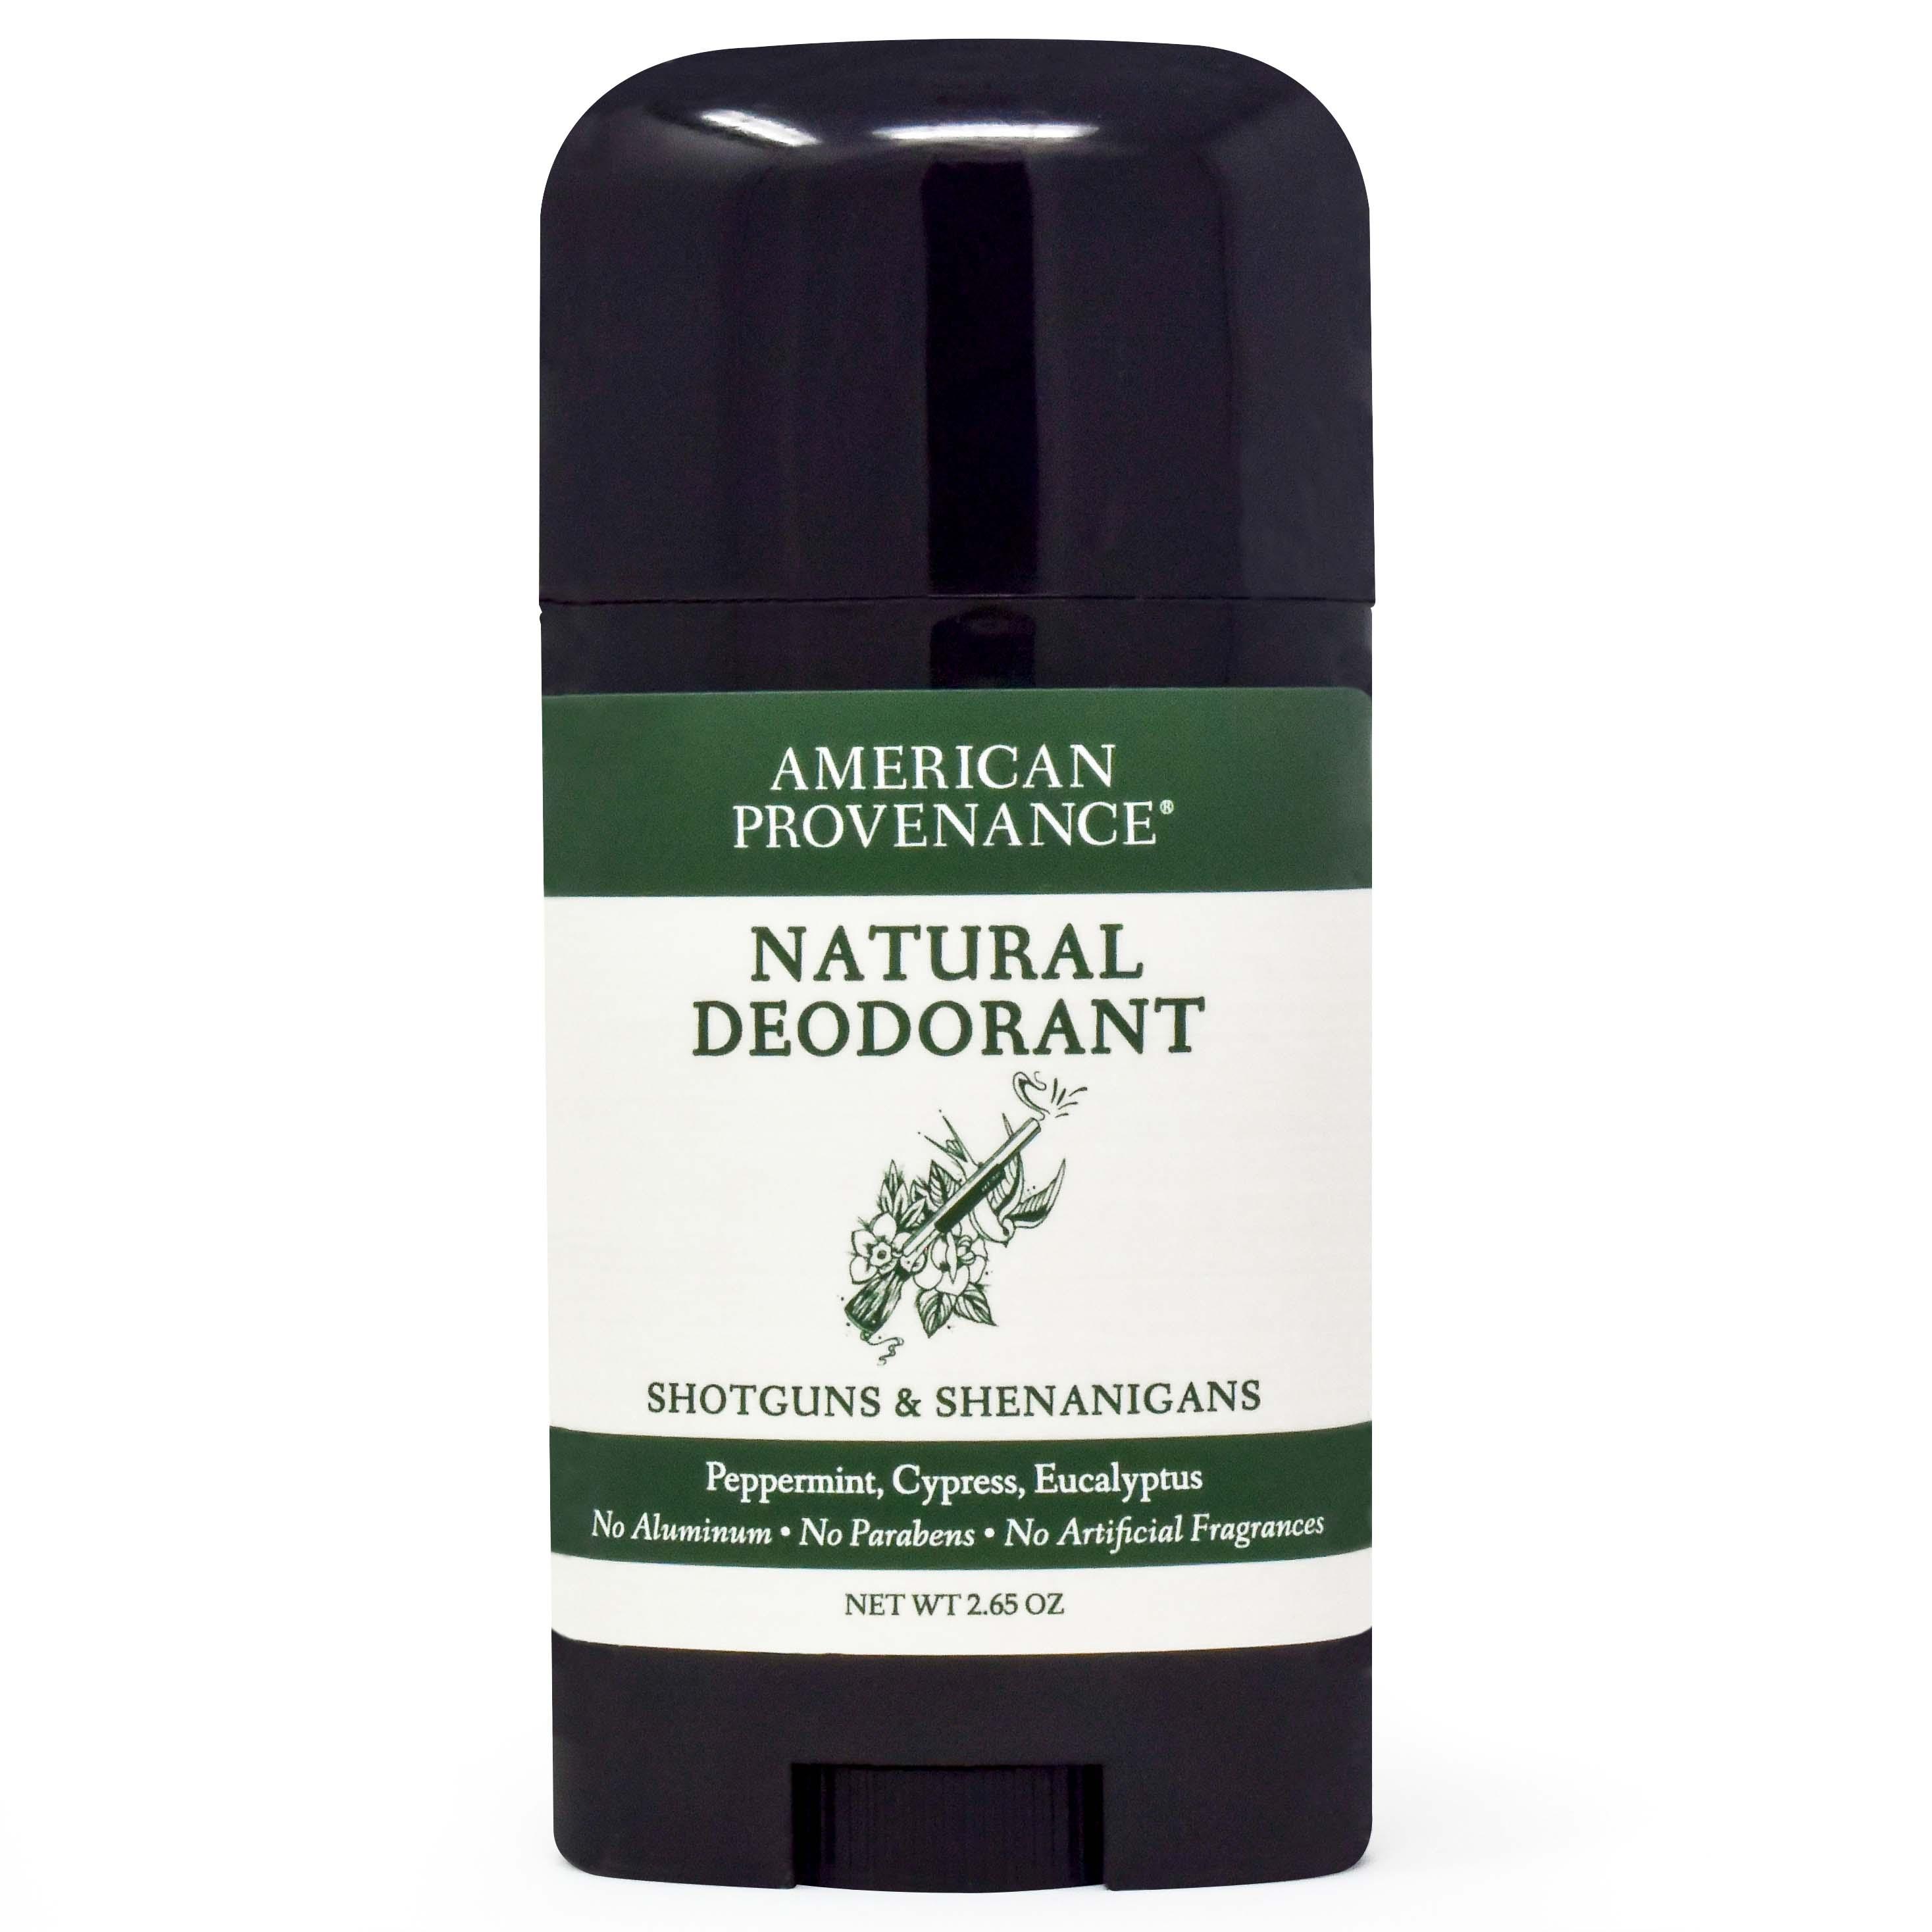 American Provenance Natural Deodorant Shotguns + Shenanigans